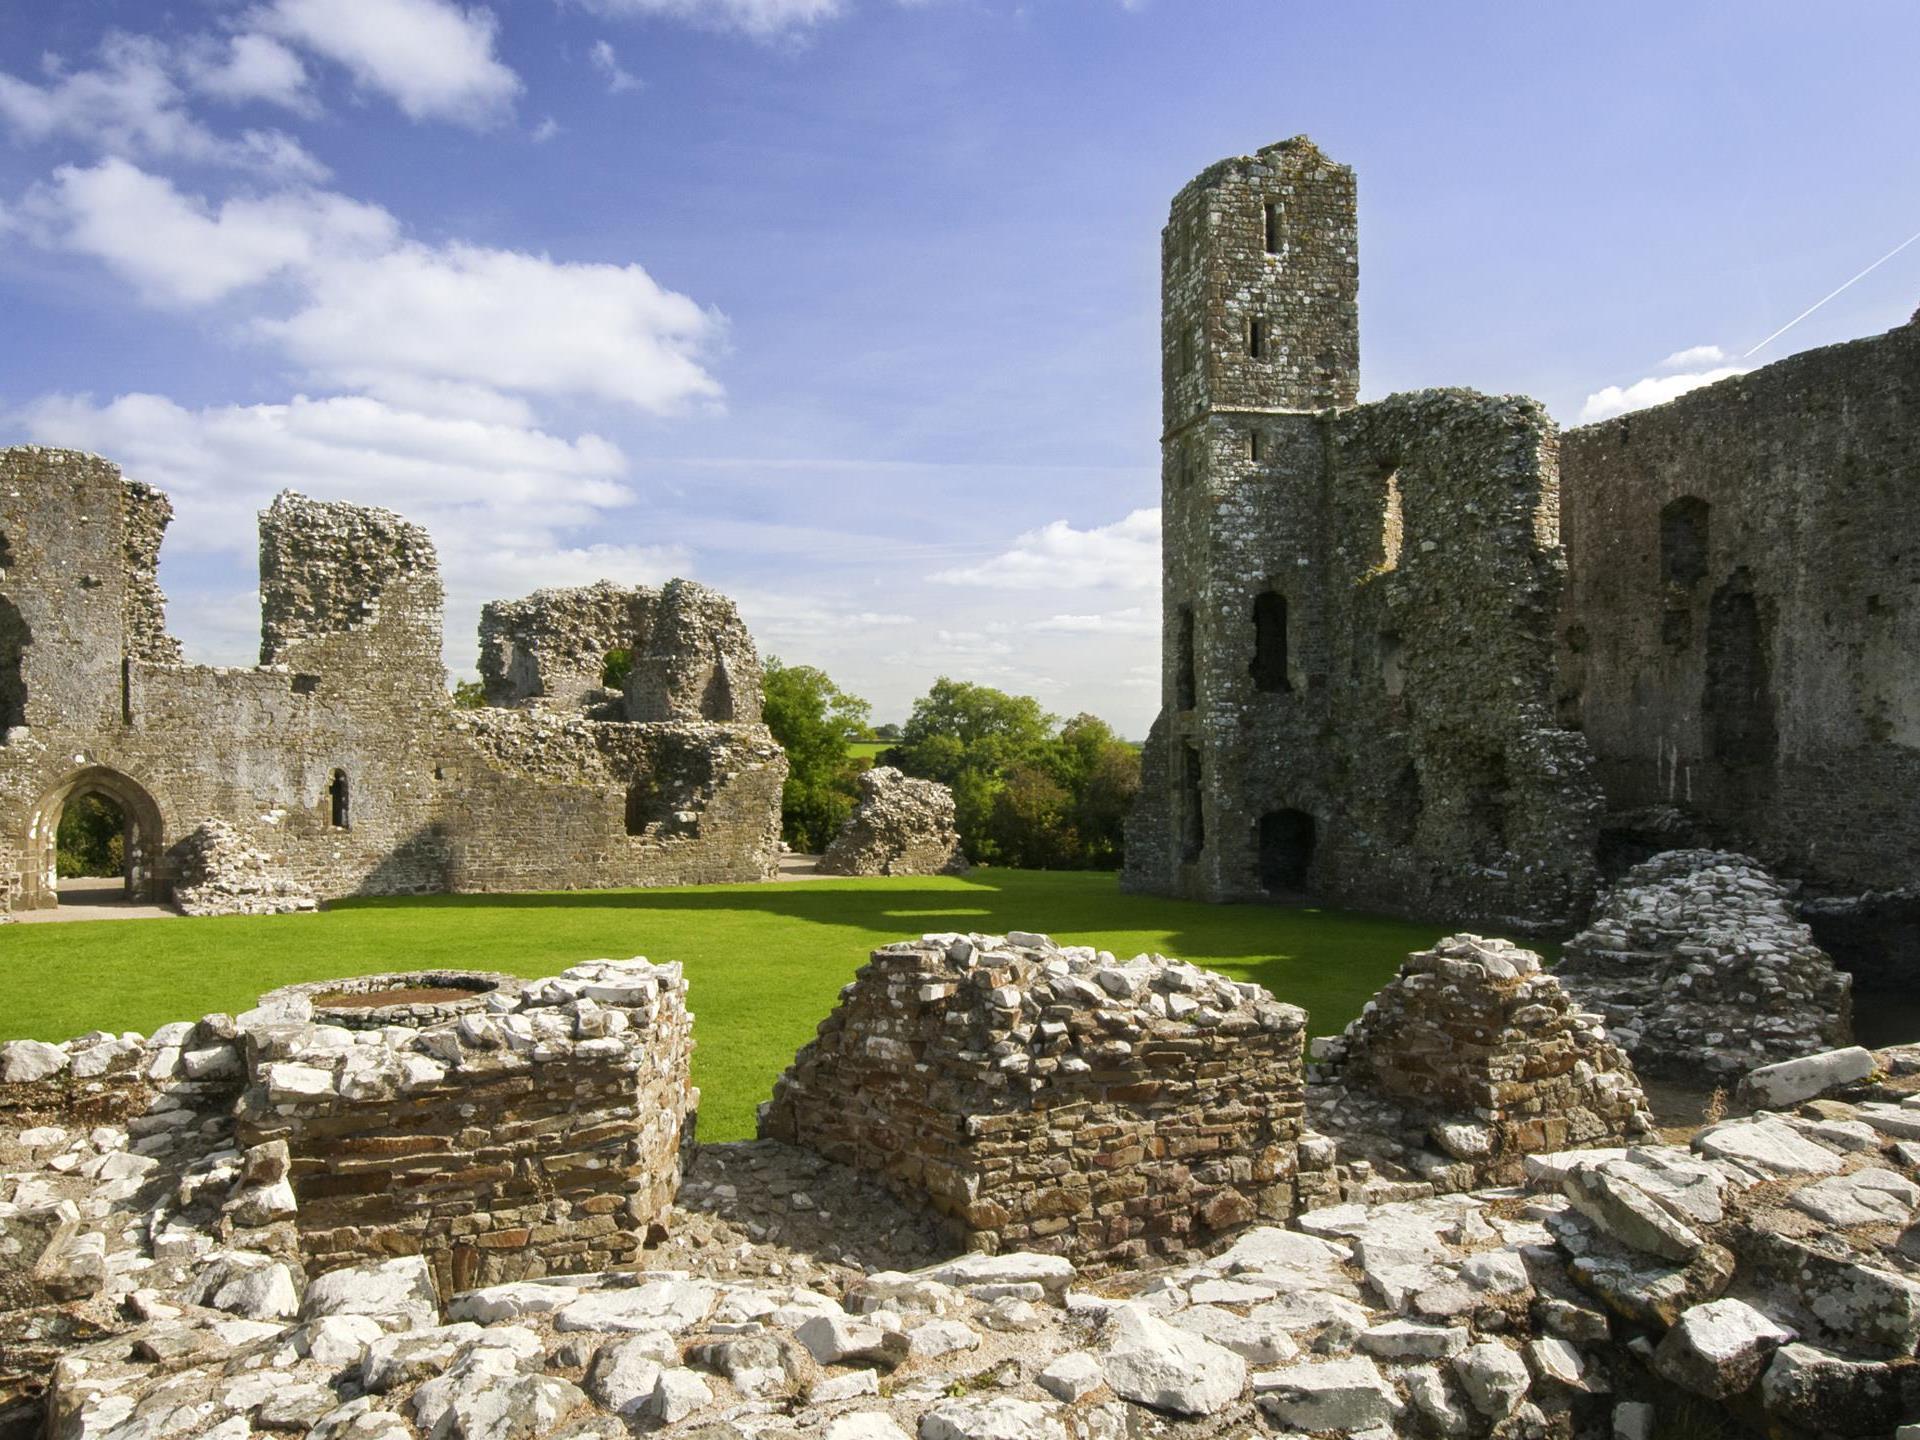 Llawhaden Castle (Cadw)